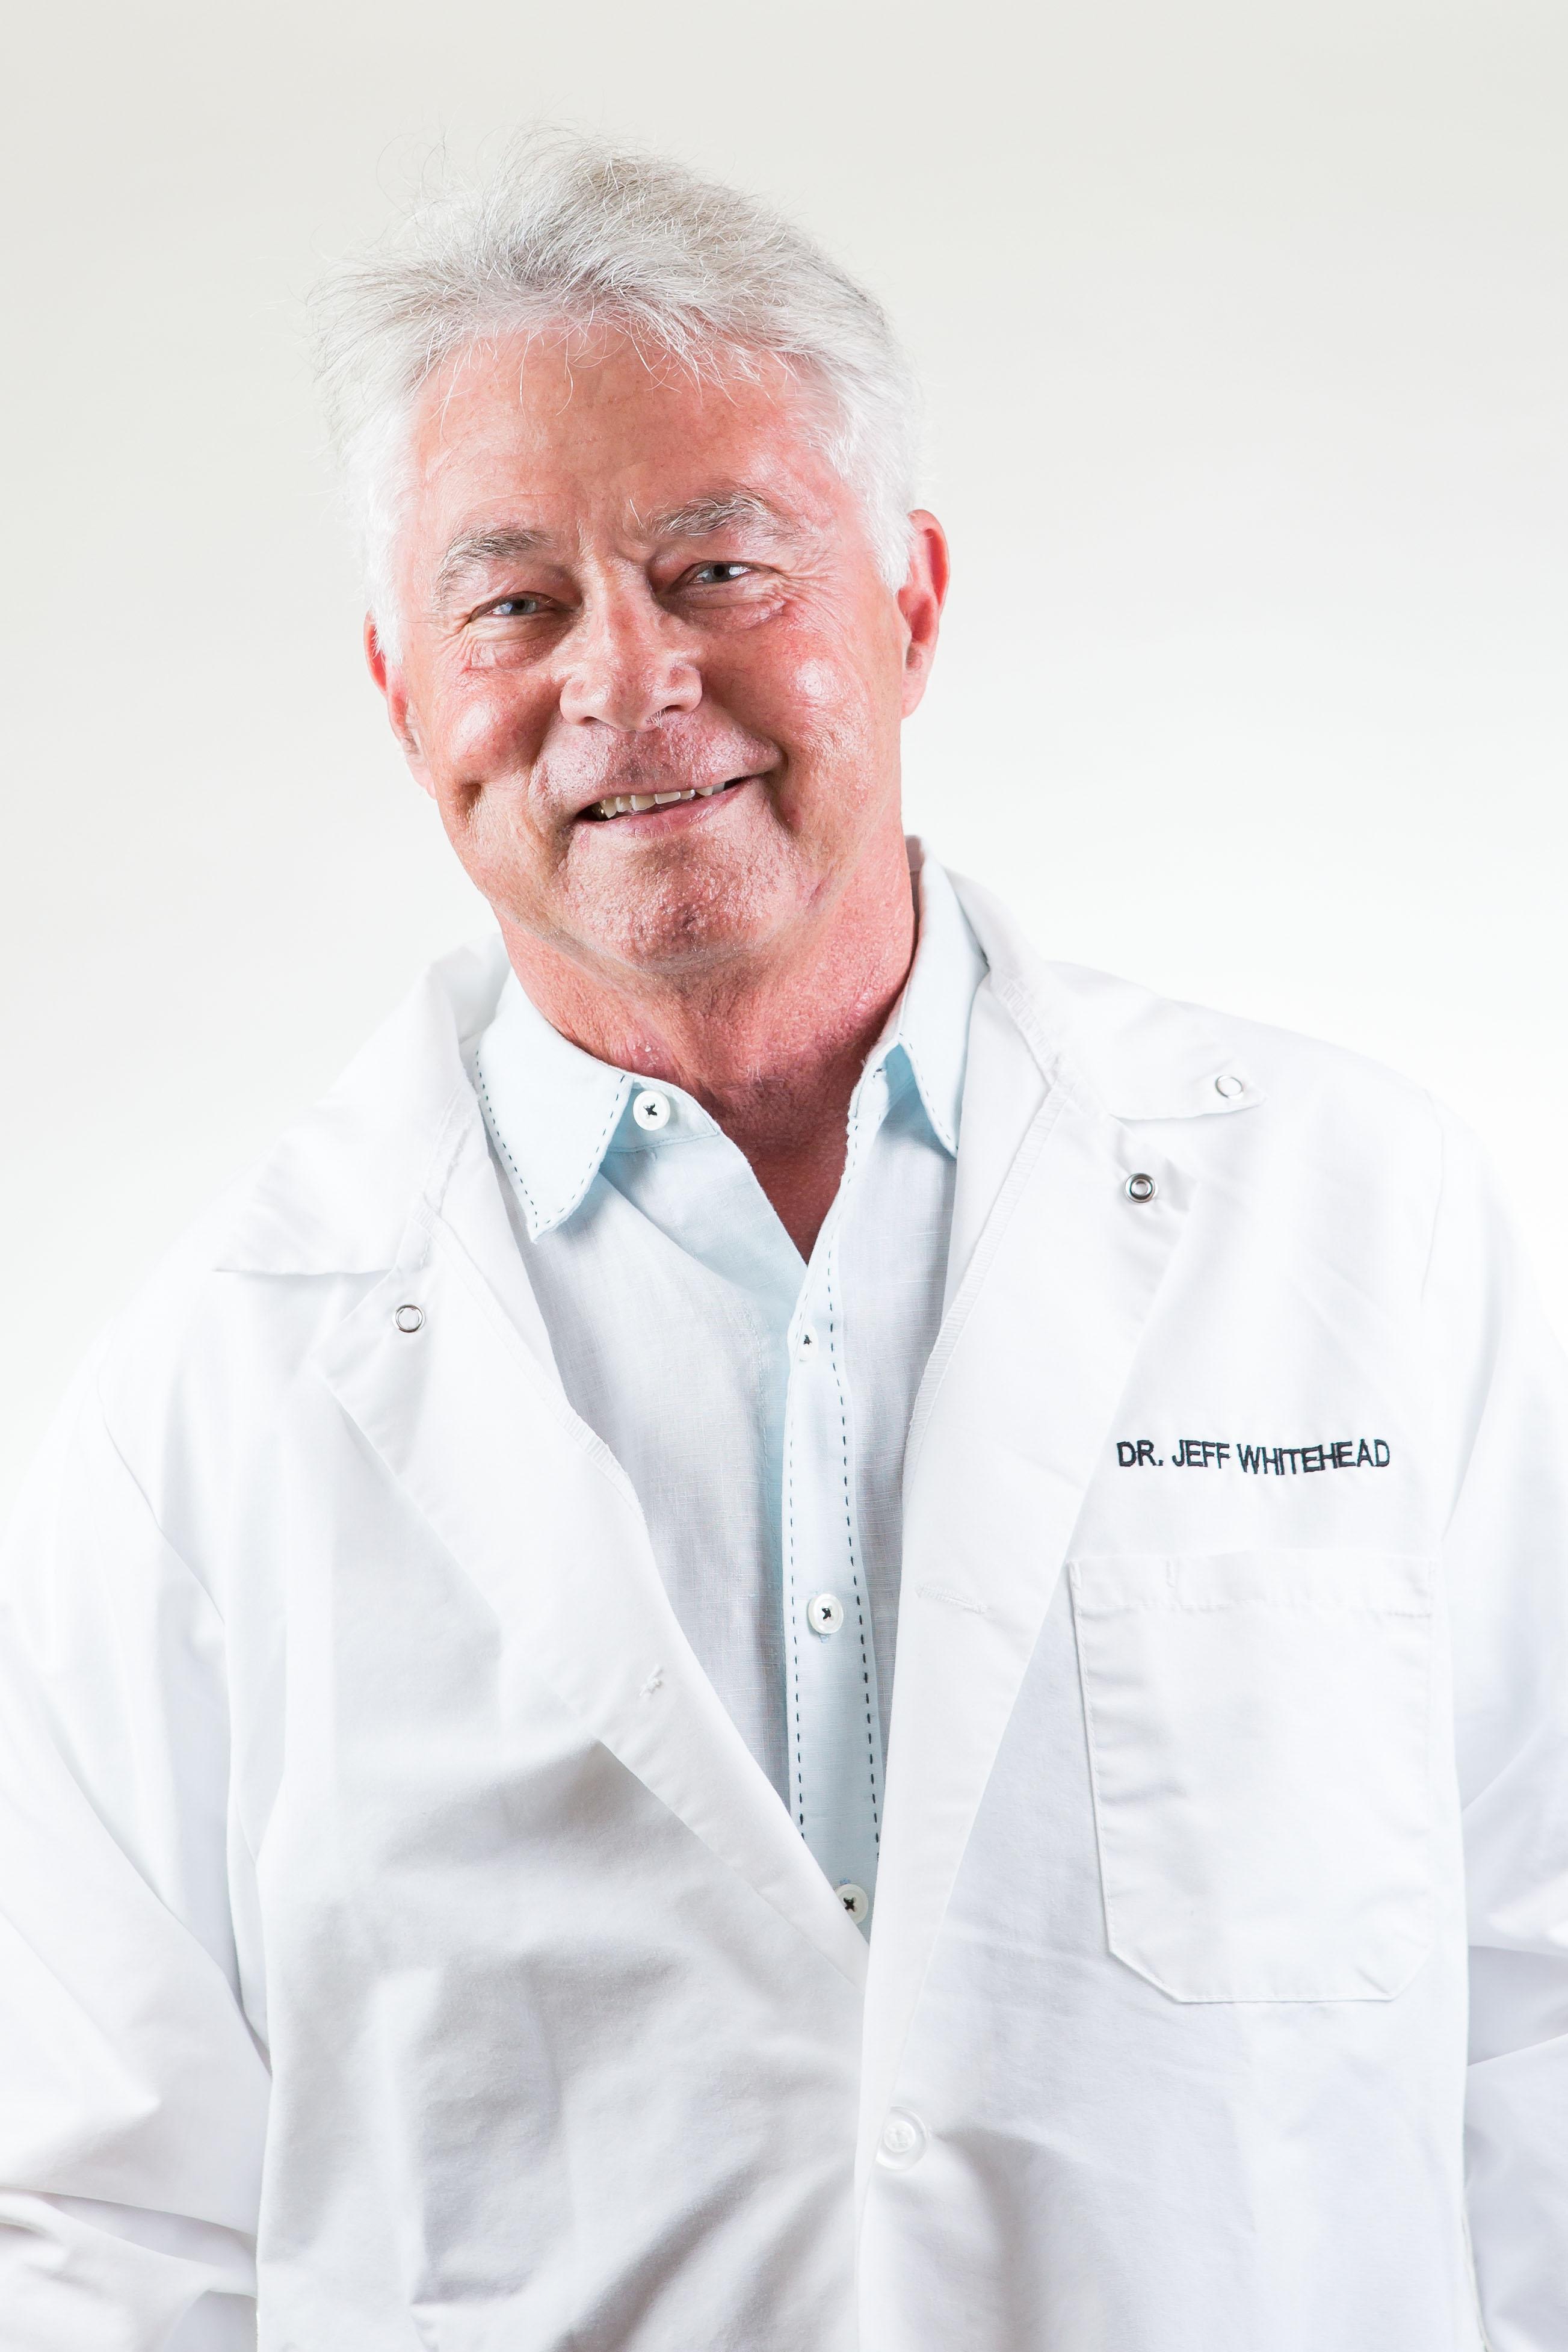 dr jeff whitehead